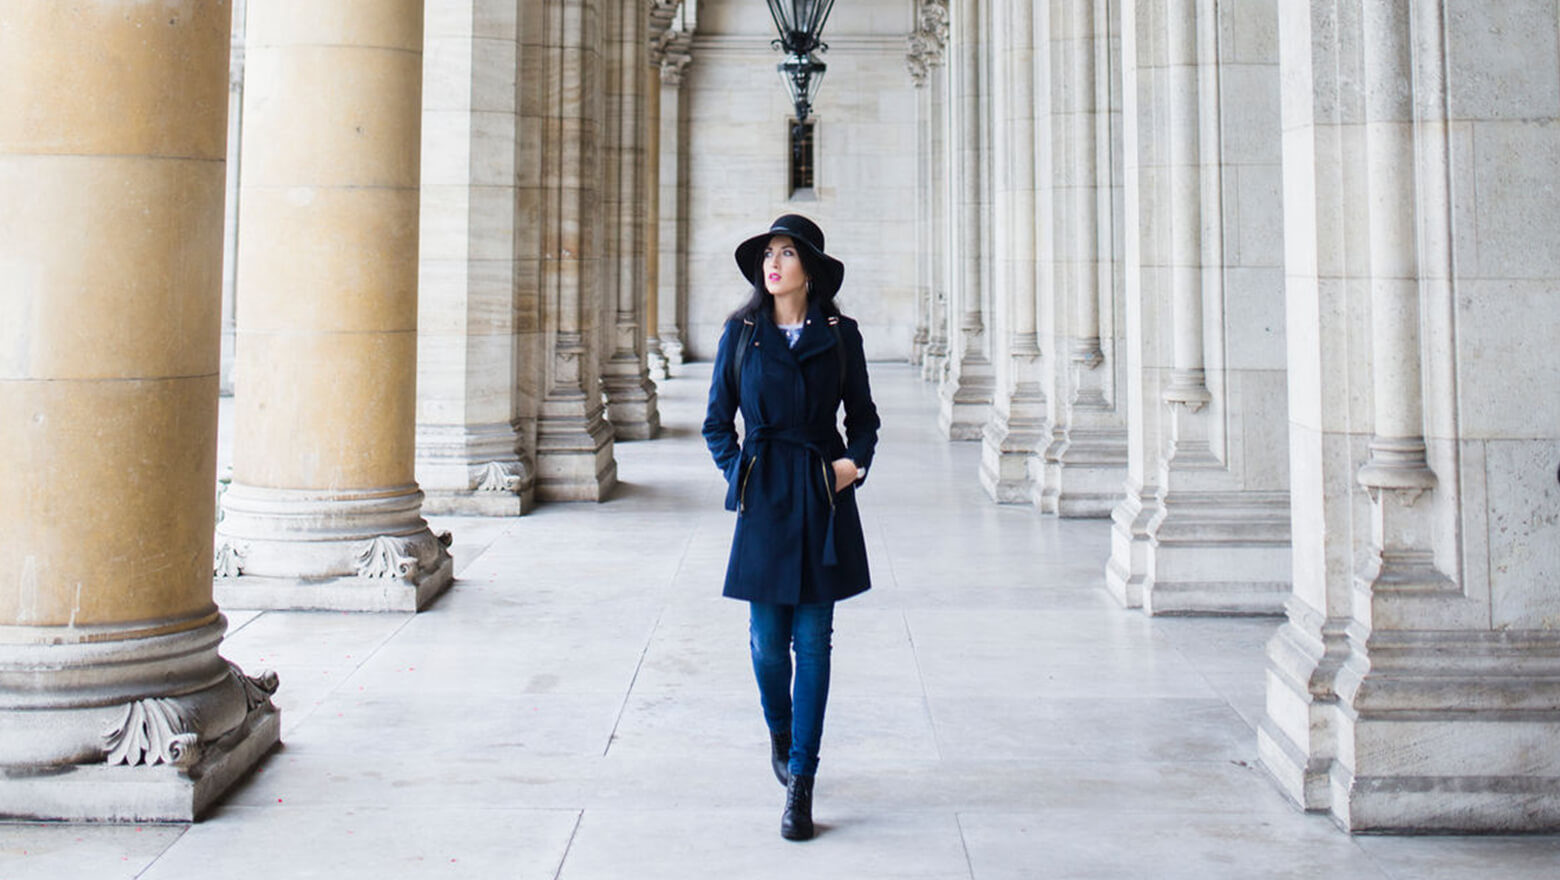 woman walking through city hall